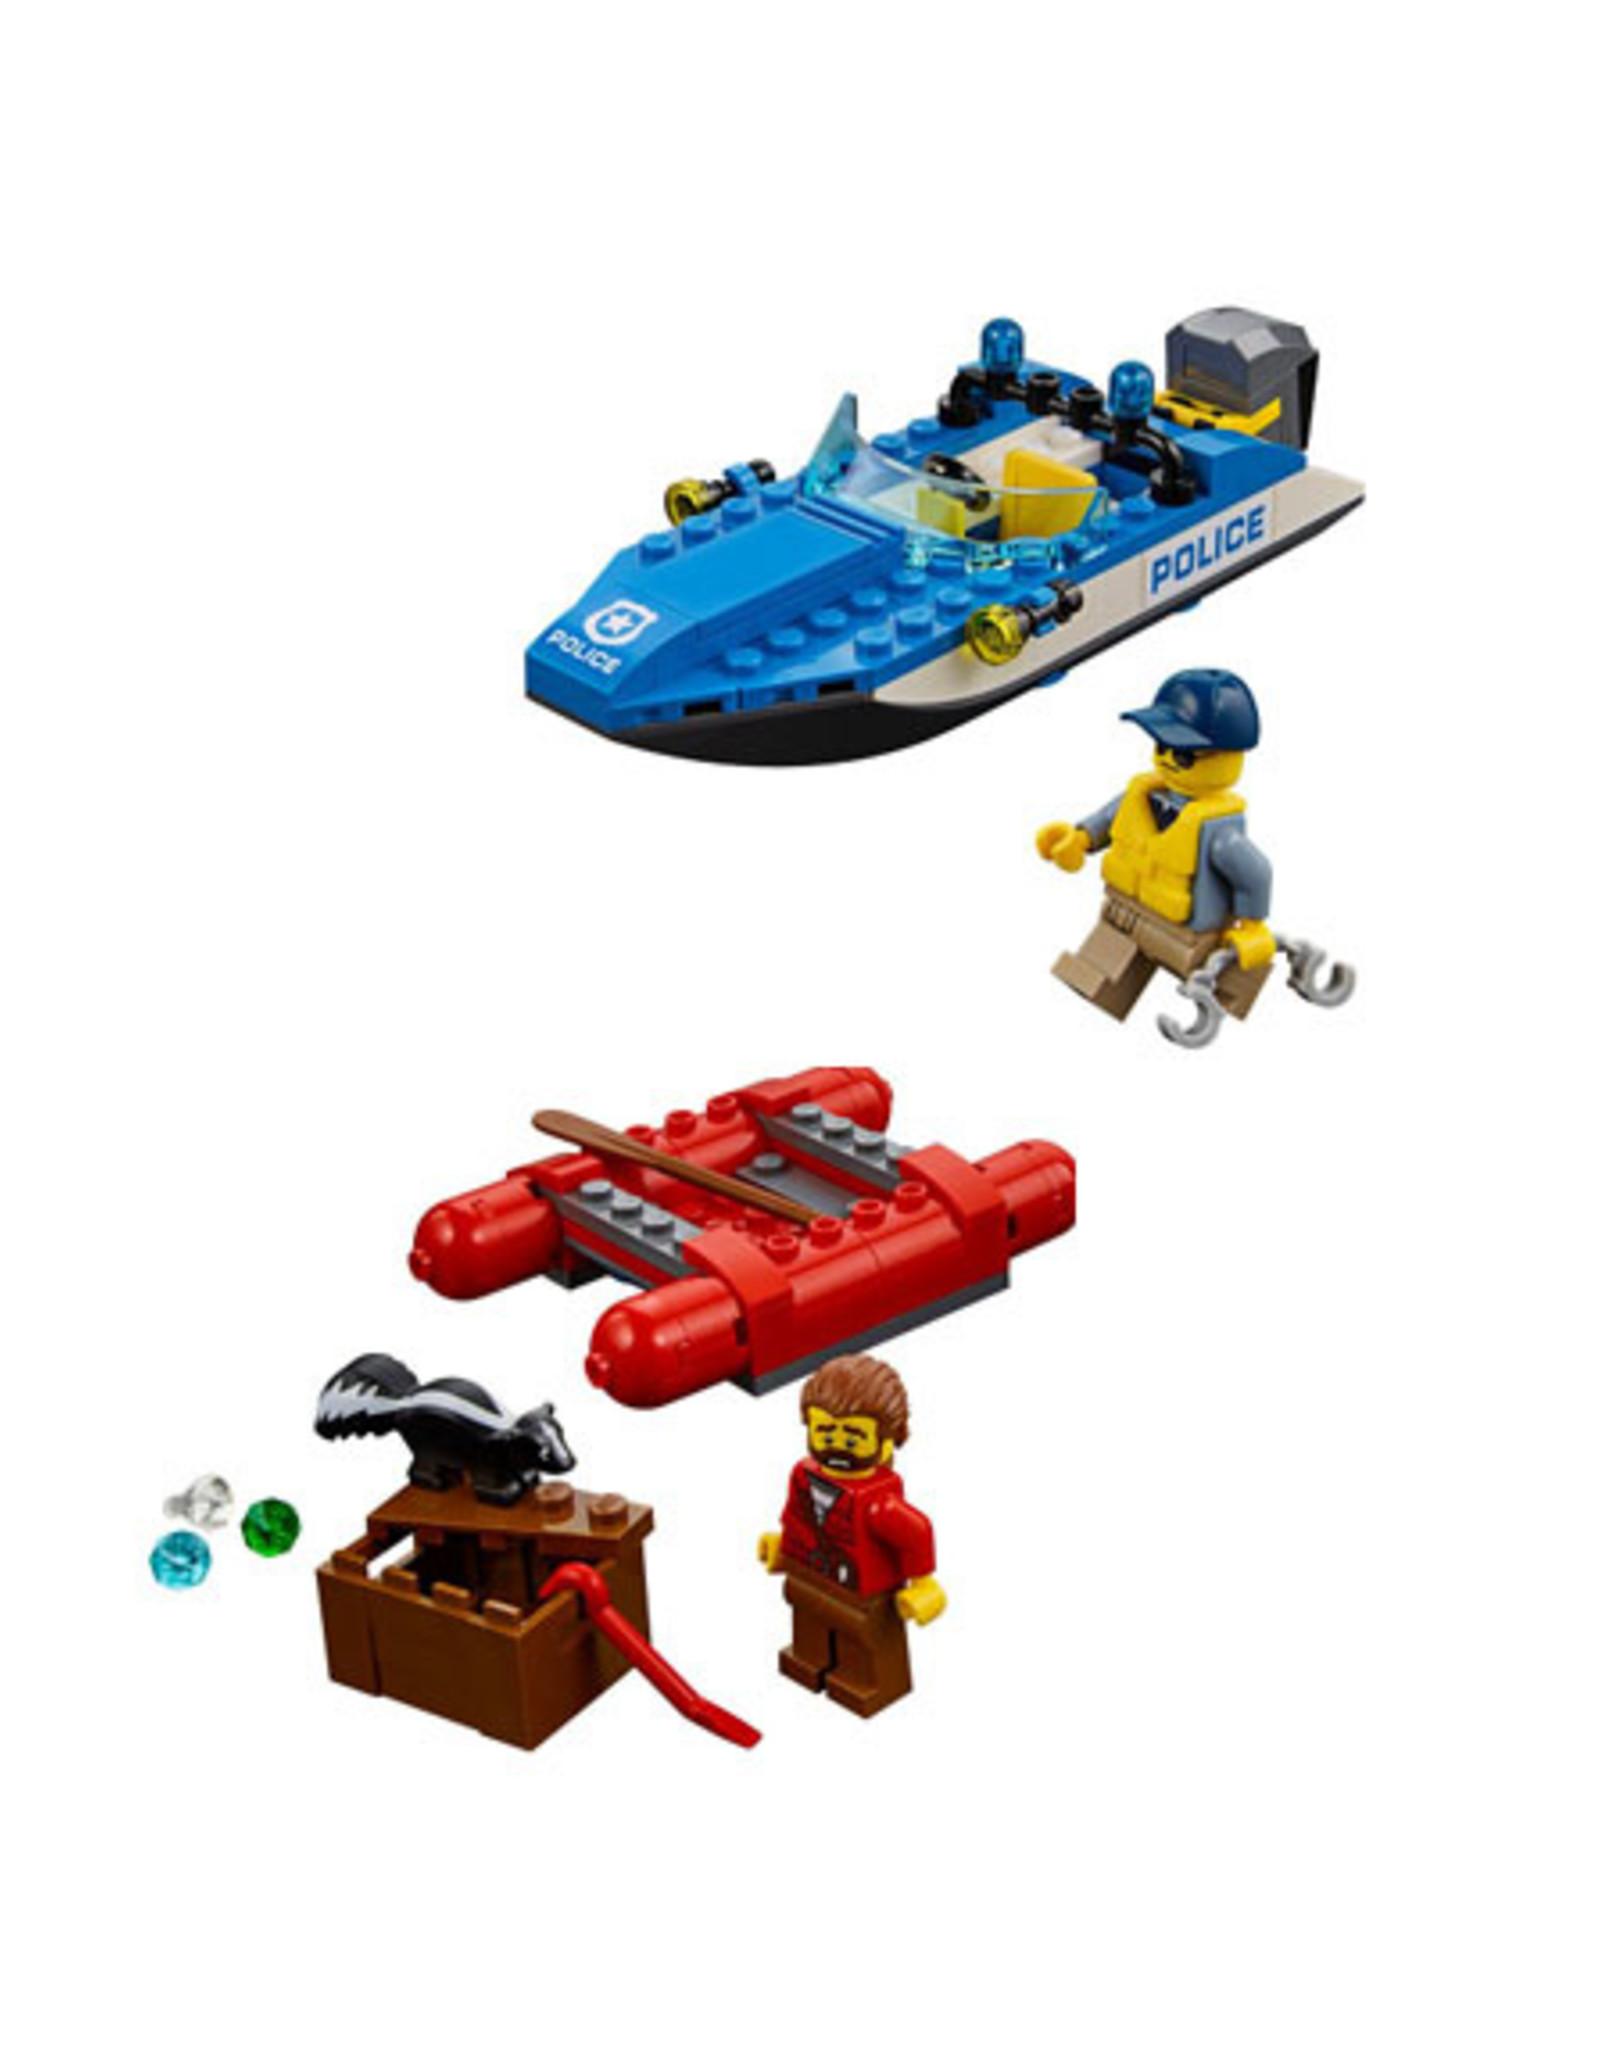 LEGO LEGO 60176 Wild River Escape CITY